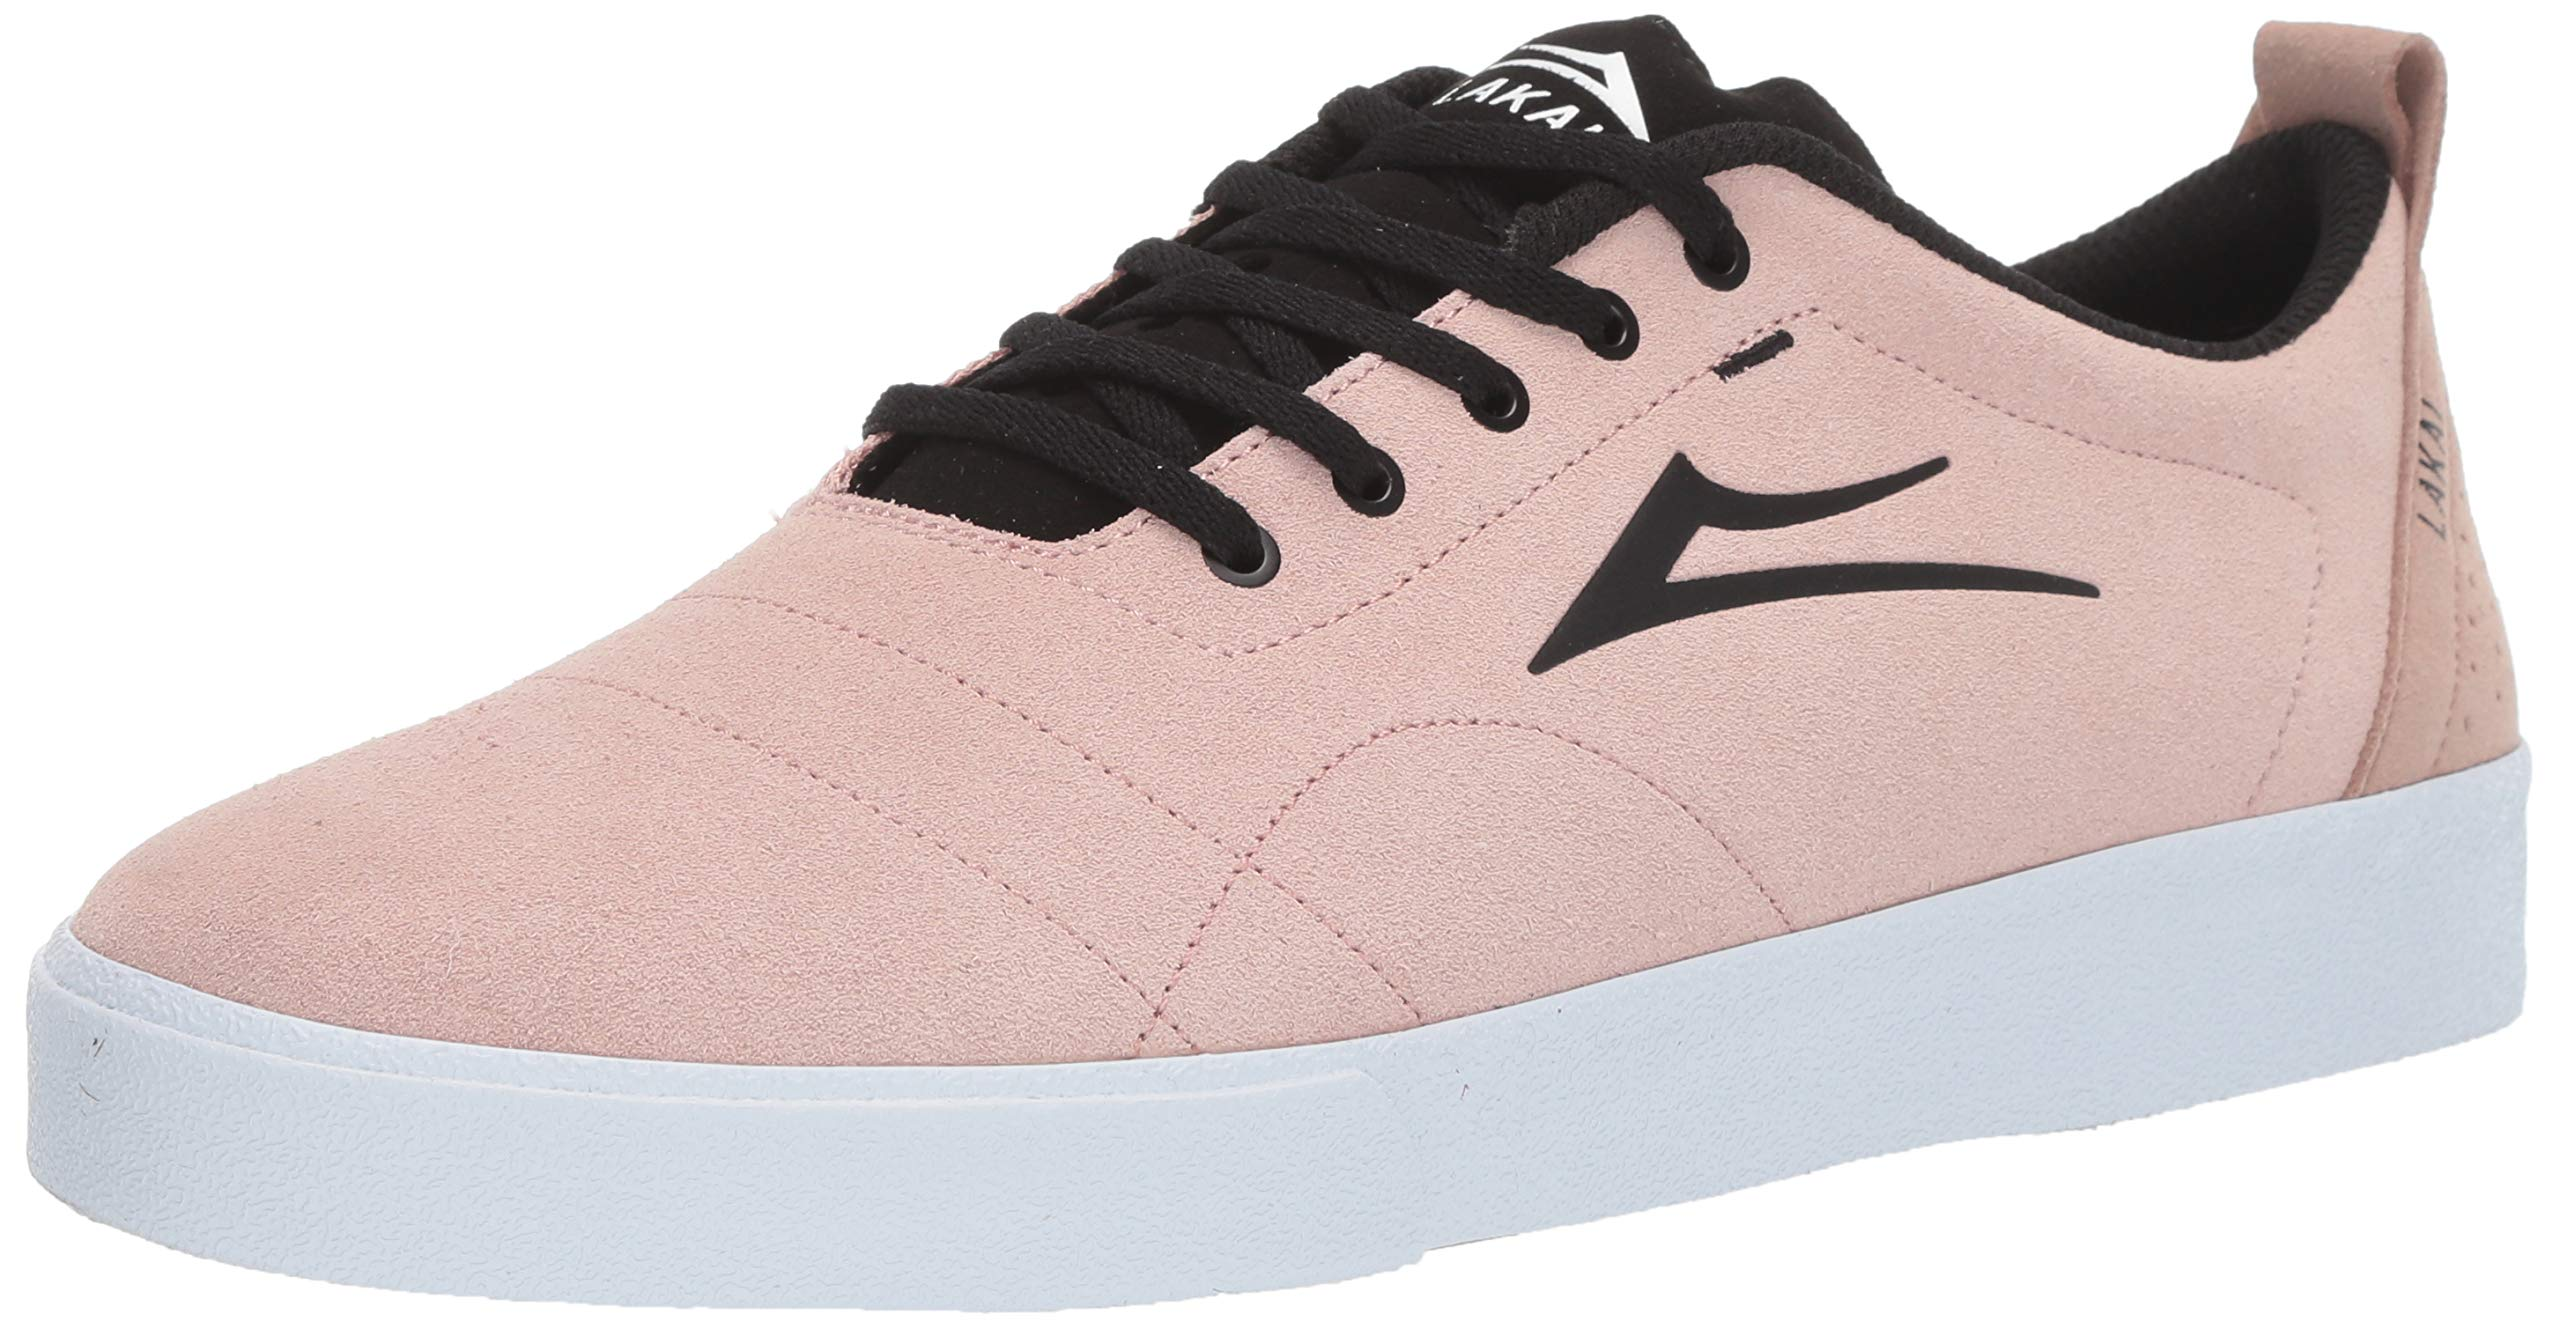 Lakai Footwear Summer 2019 Bristol Rose Suede Size 9.5 Tennis Shoe, M US by Lakai